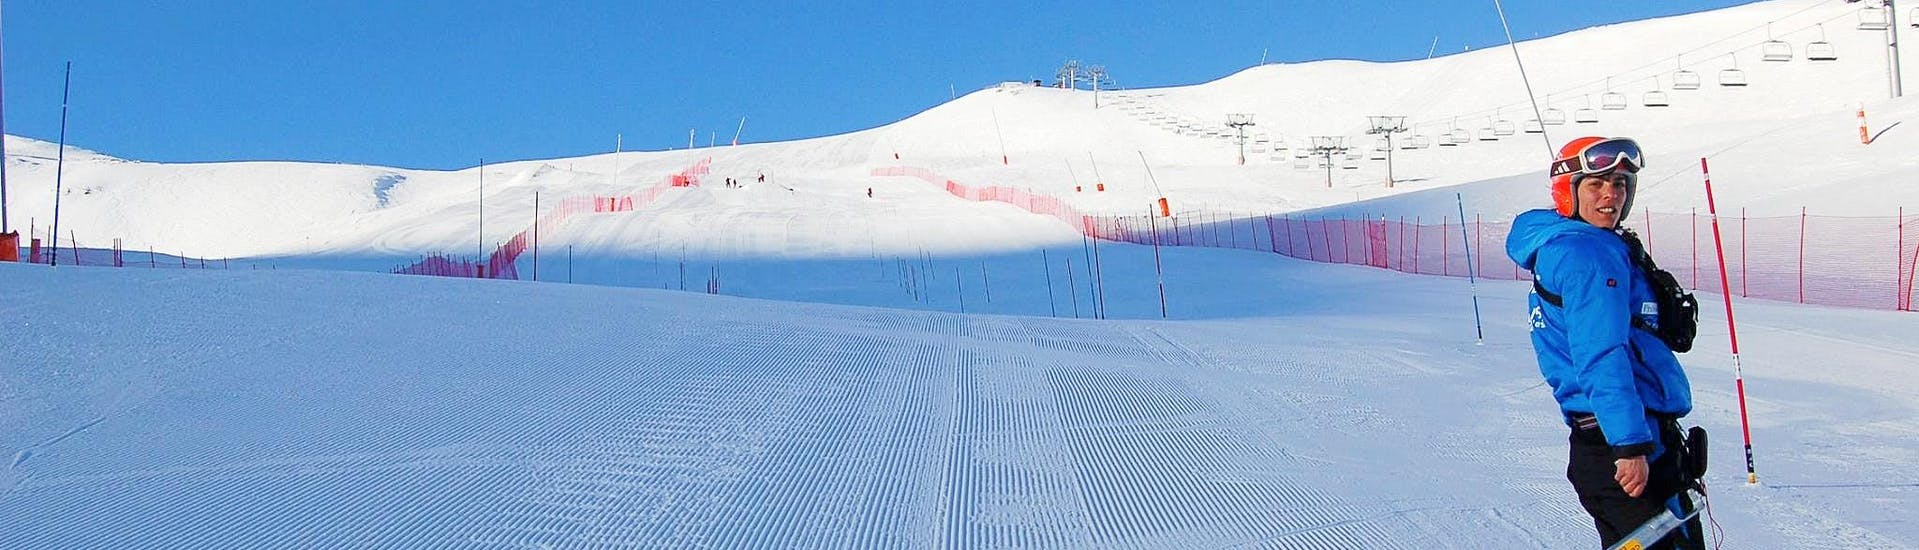 adult-ski-lessons-for-all-levels-escola-vall-de-boi-hero